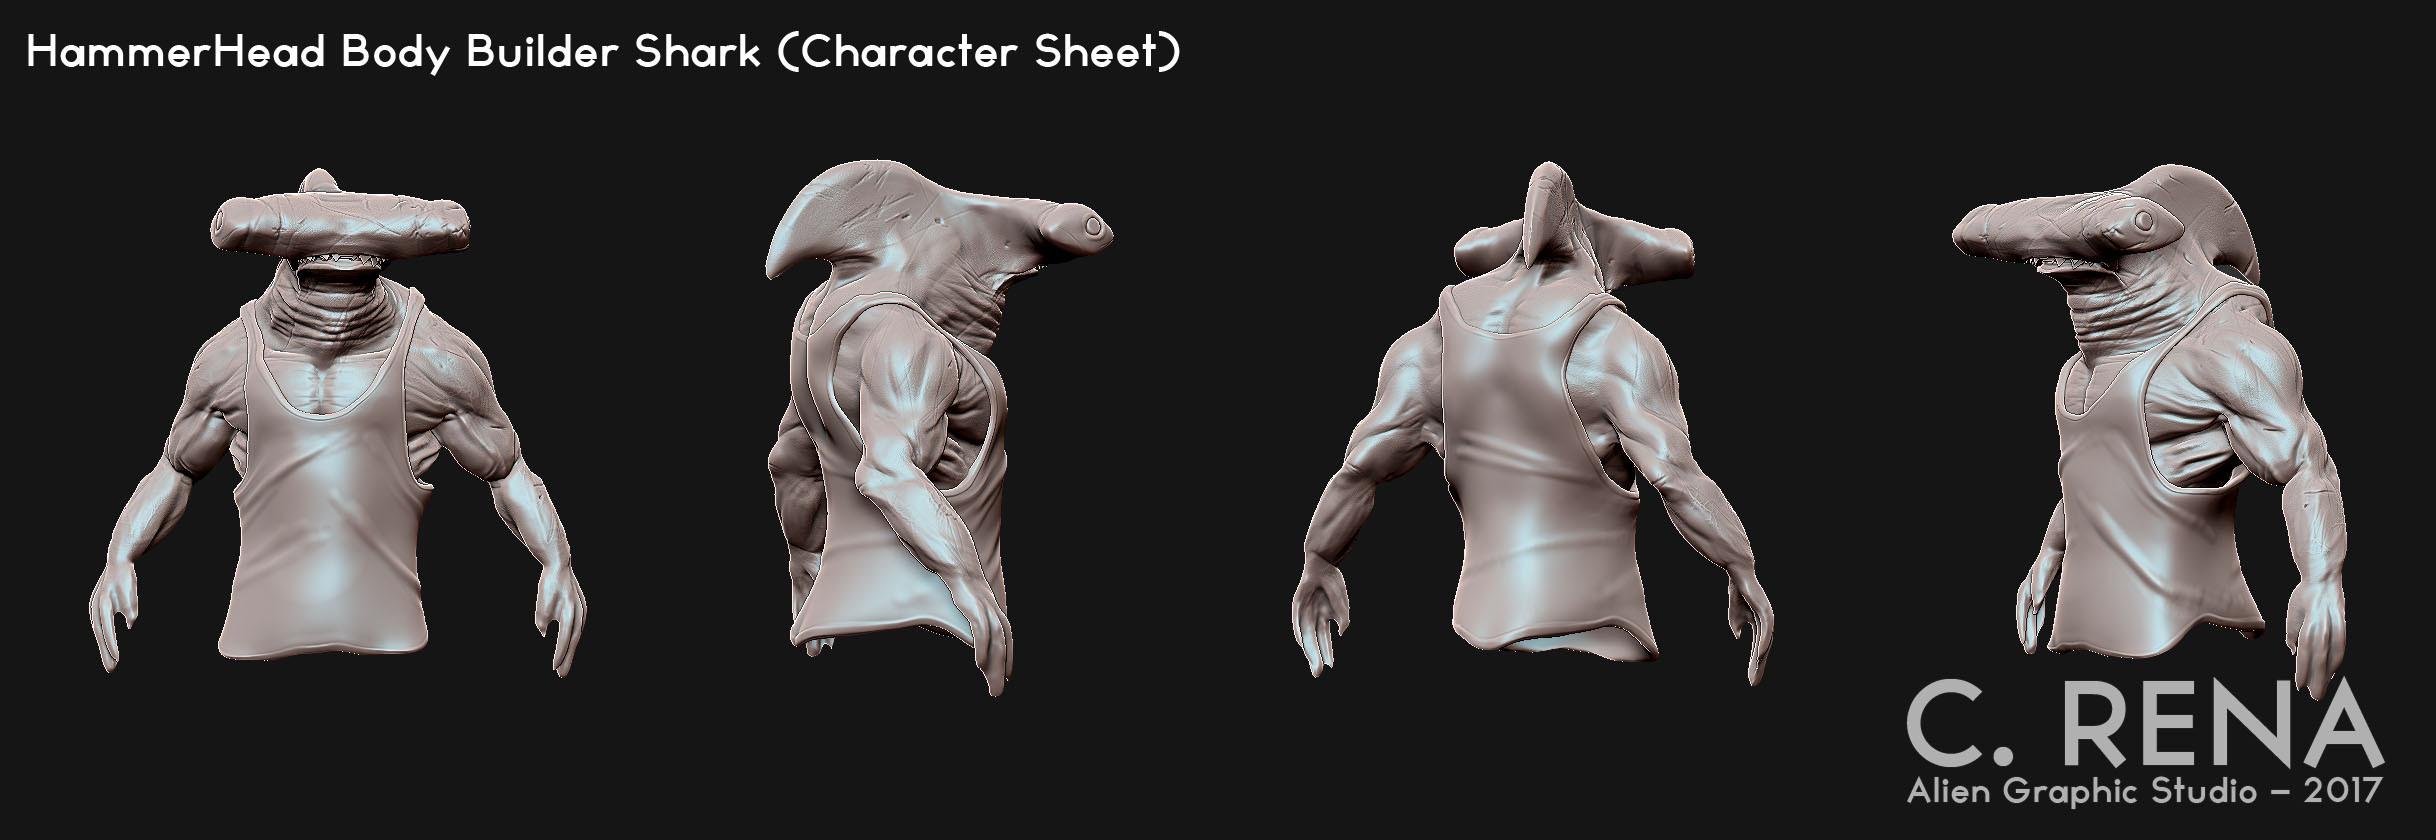 Character study ZBrush